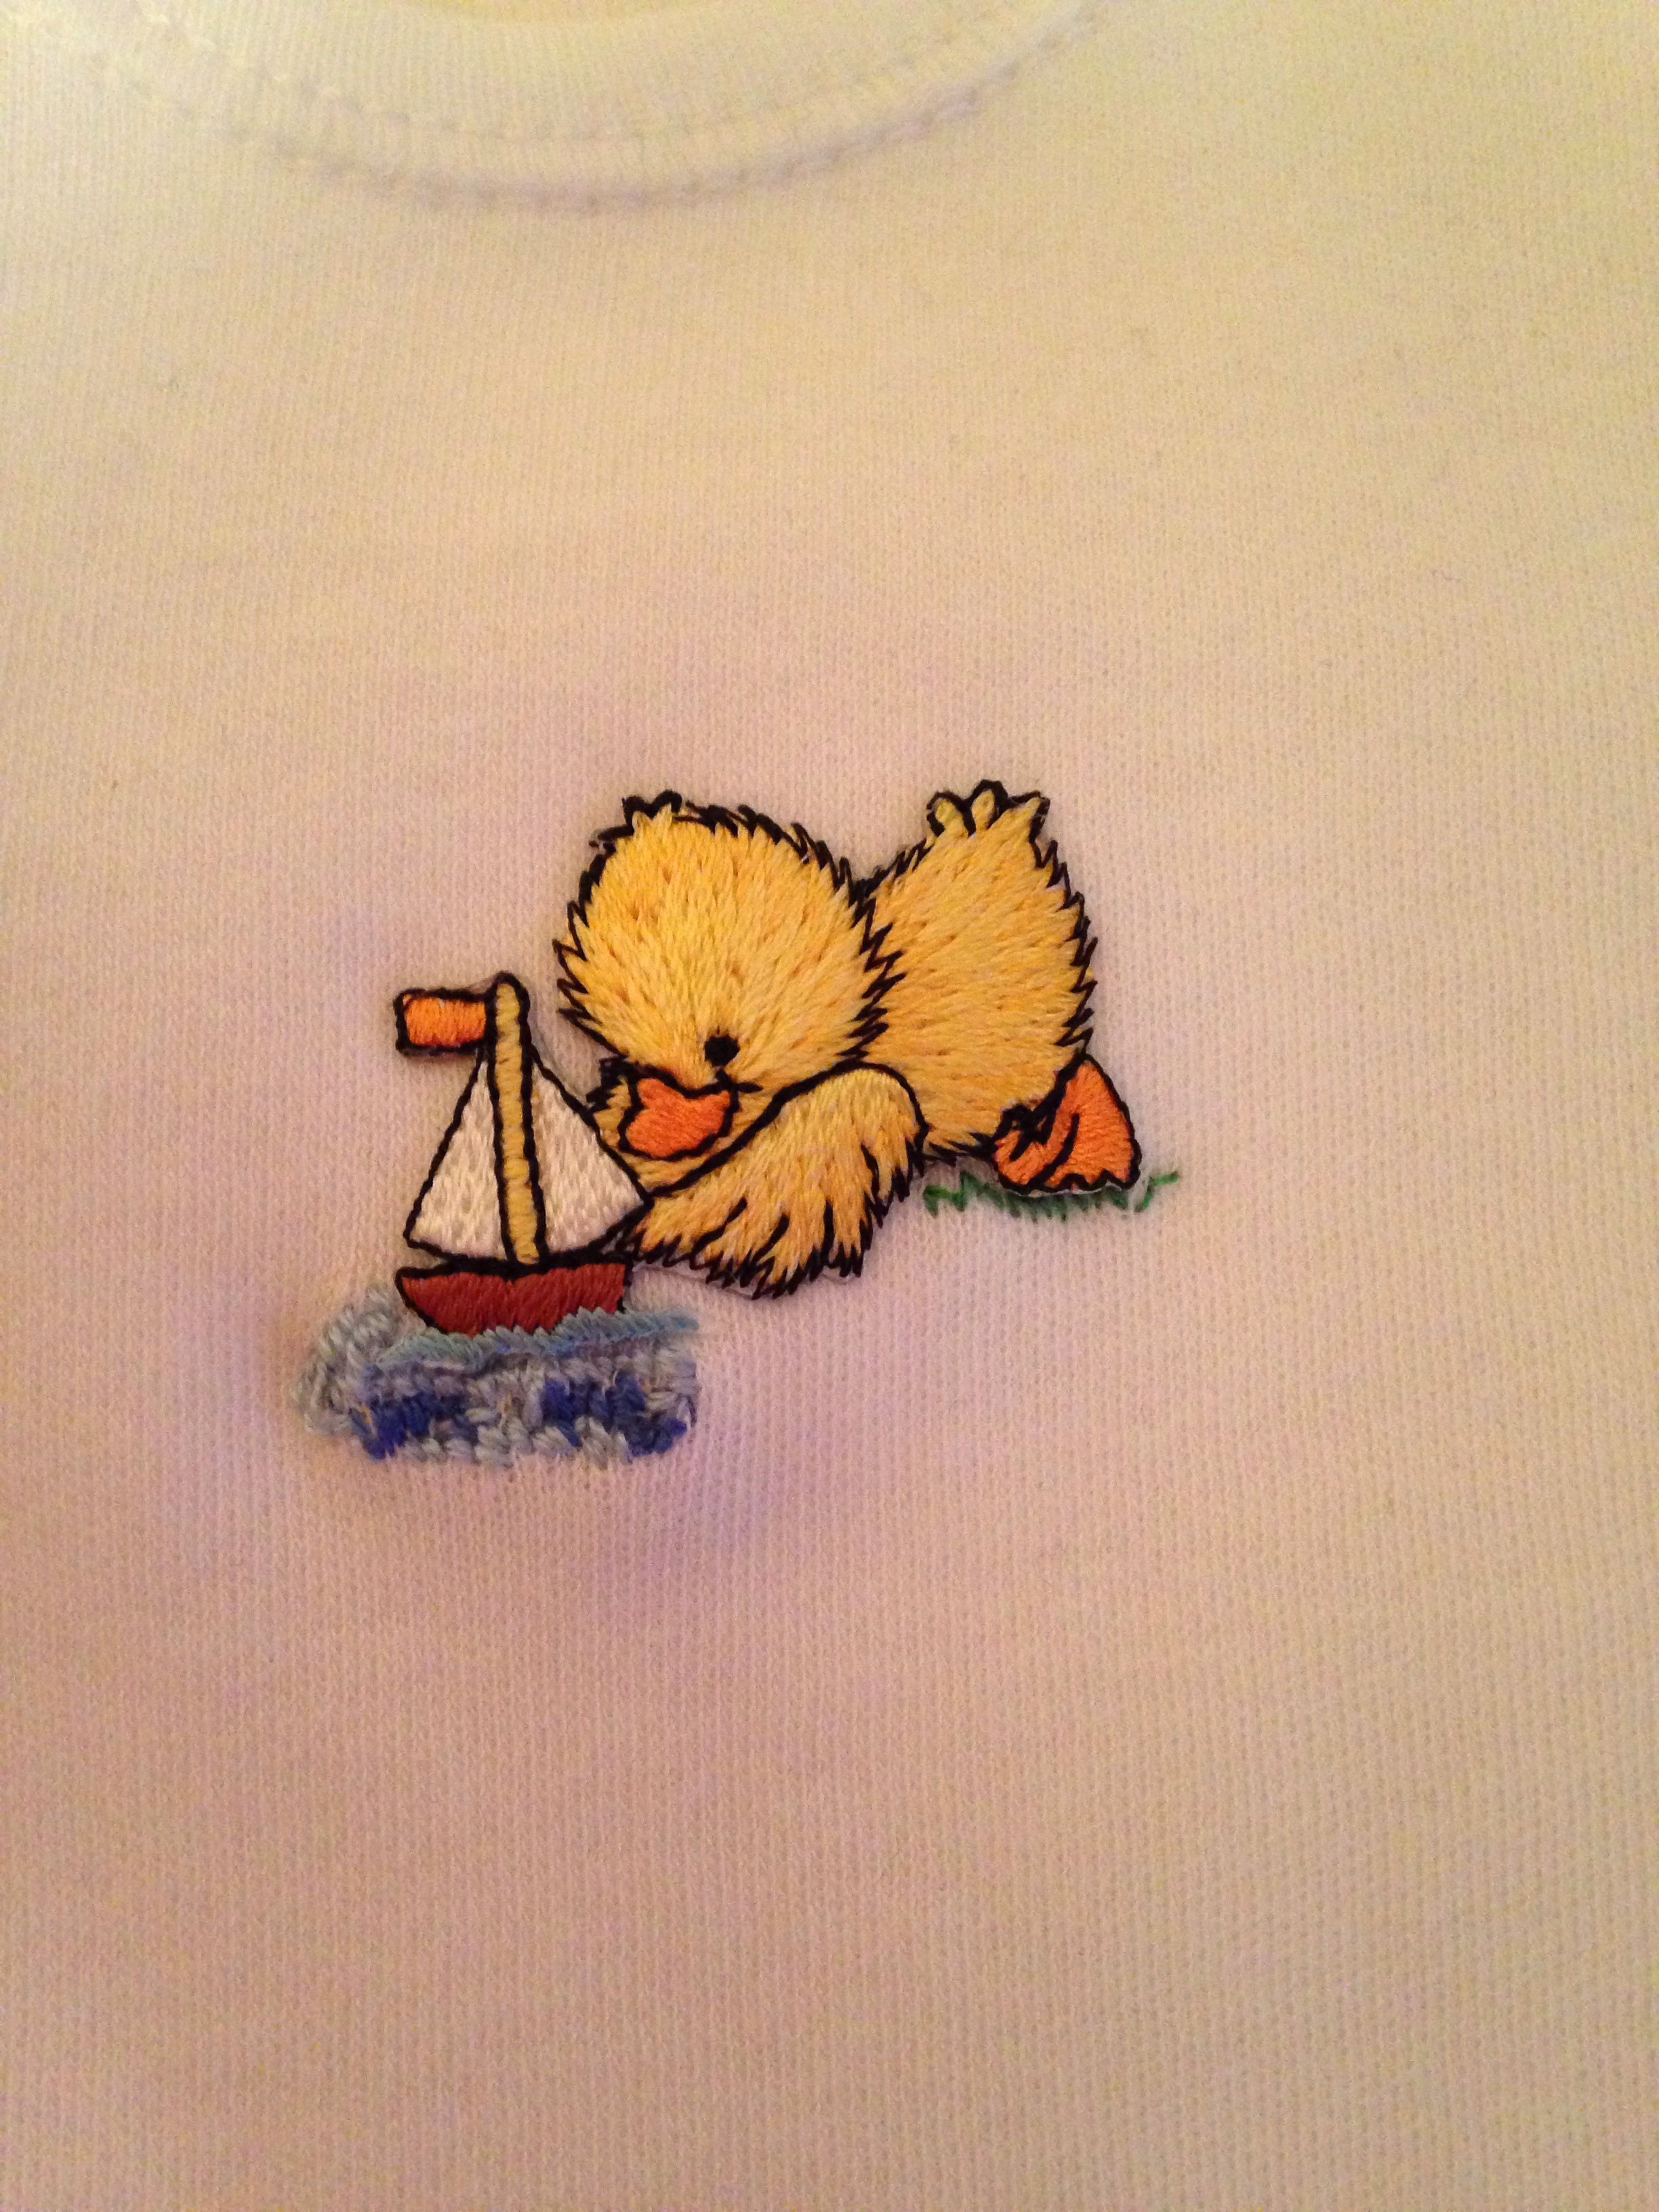 Ducky with sail boat appliqué on long sleeve baby grow